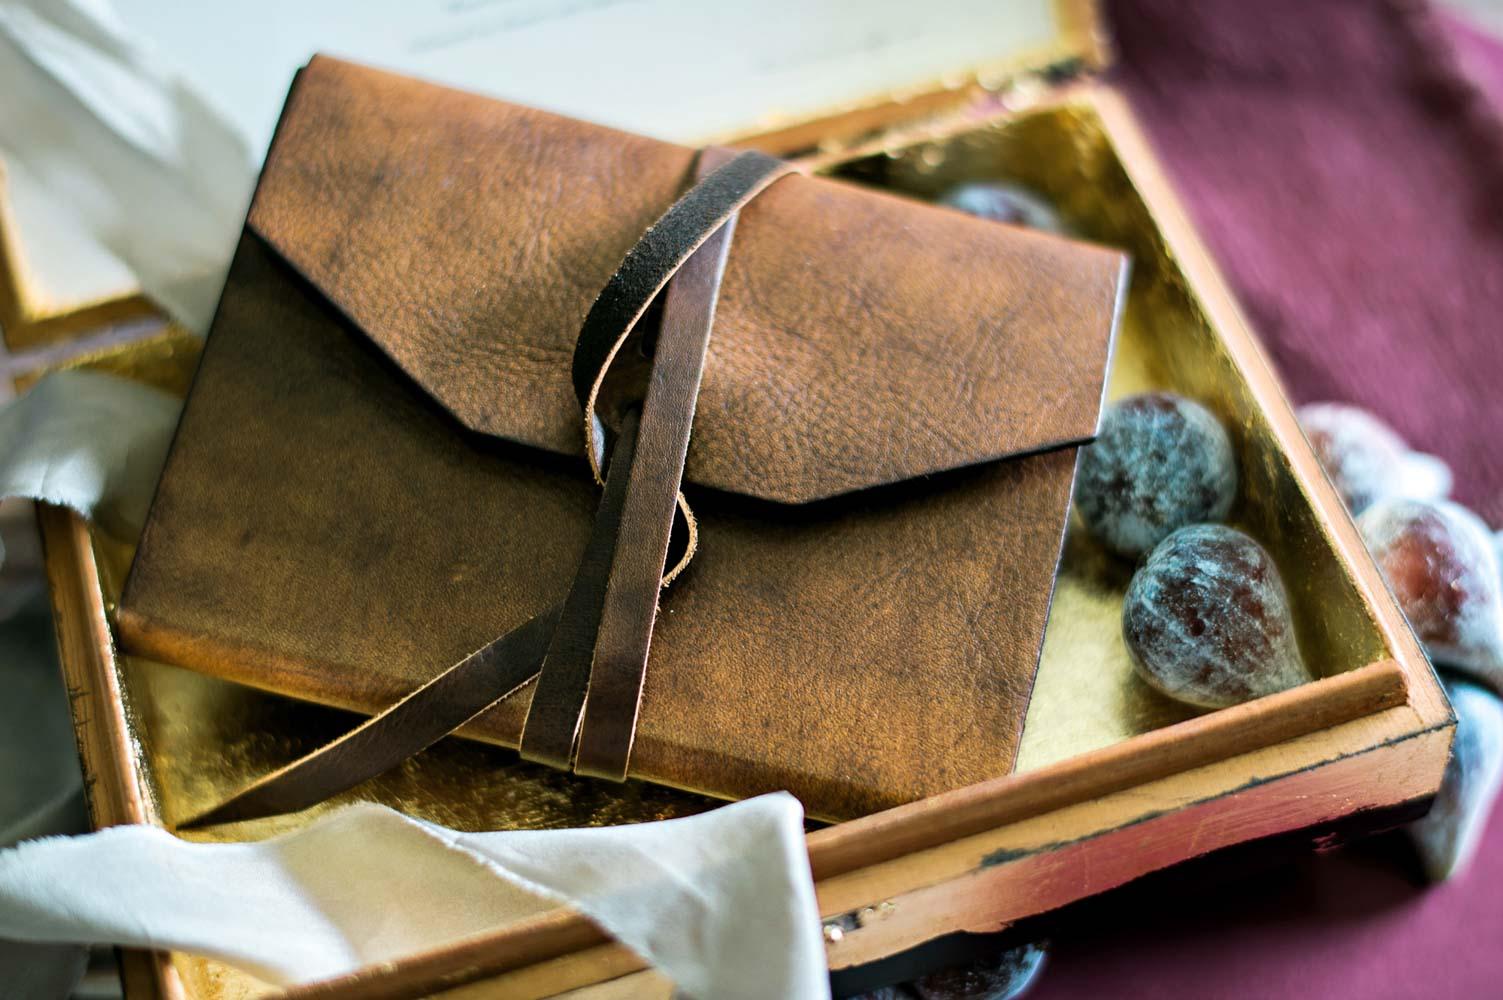 leather bound journal in wooden box wedding favor